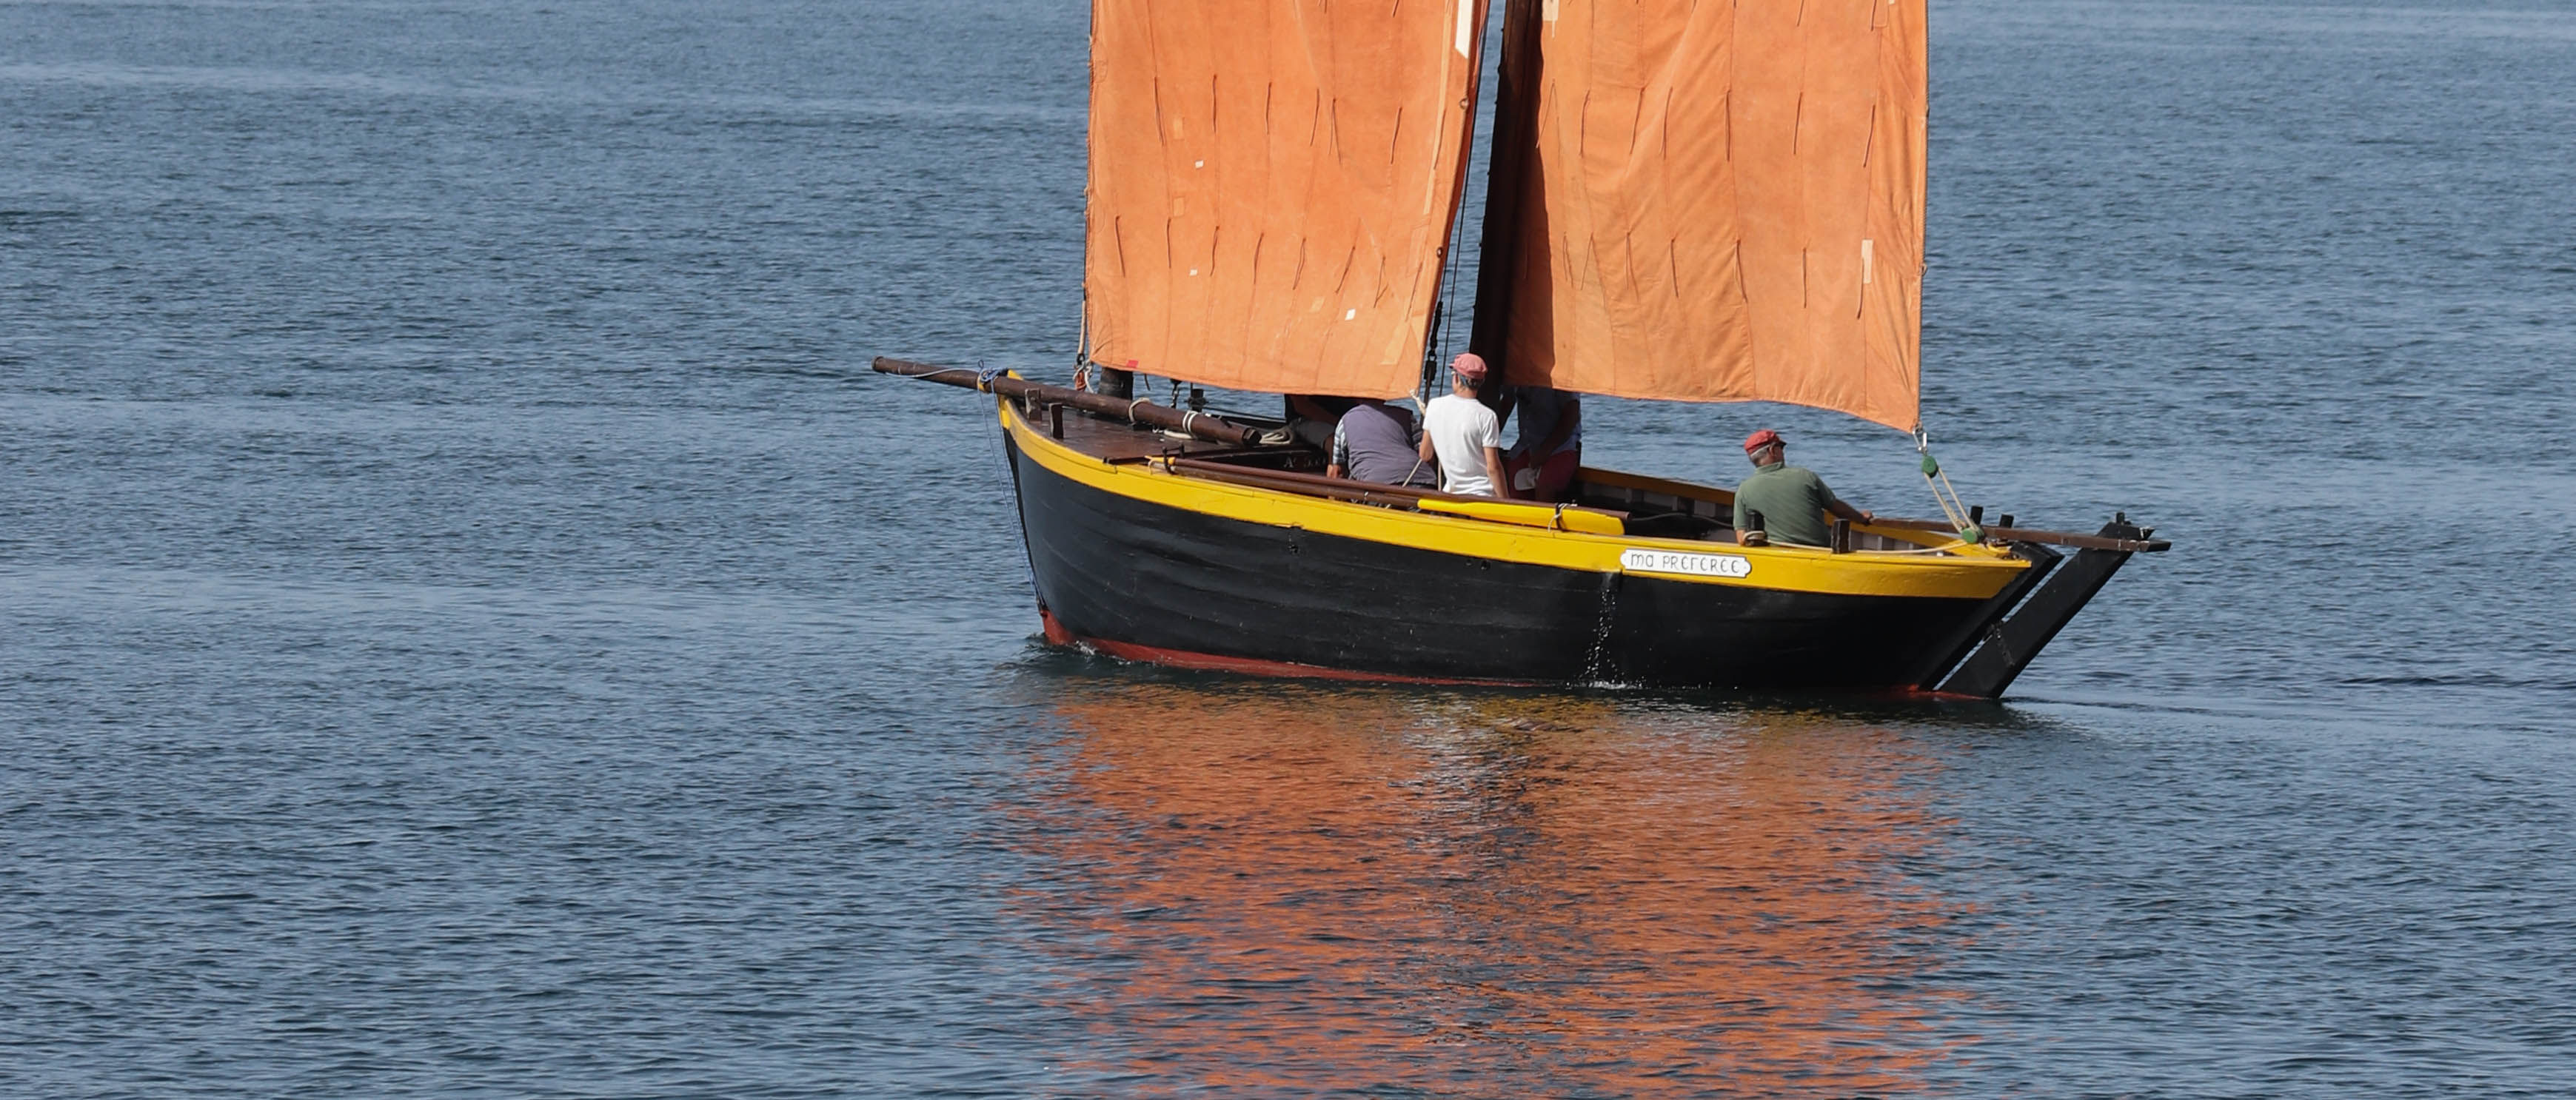 ma préférée, la trinité s-mer, 6 août 19, 9h55.jpg